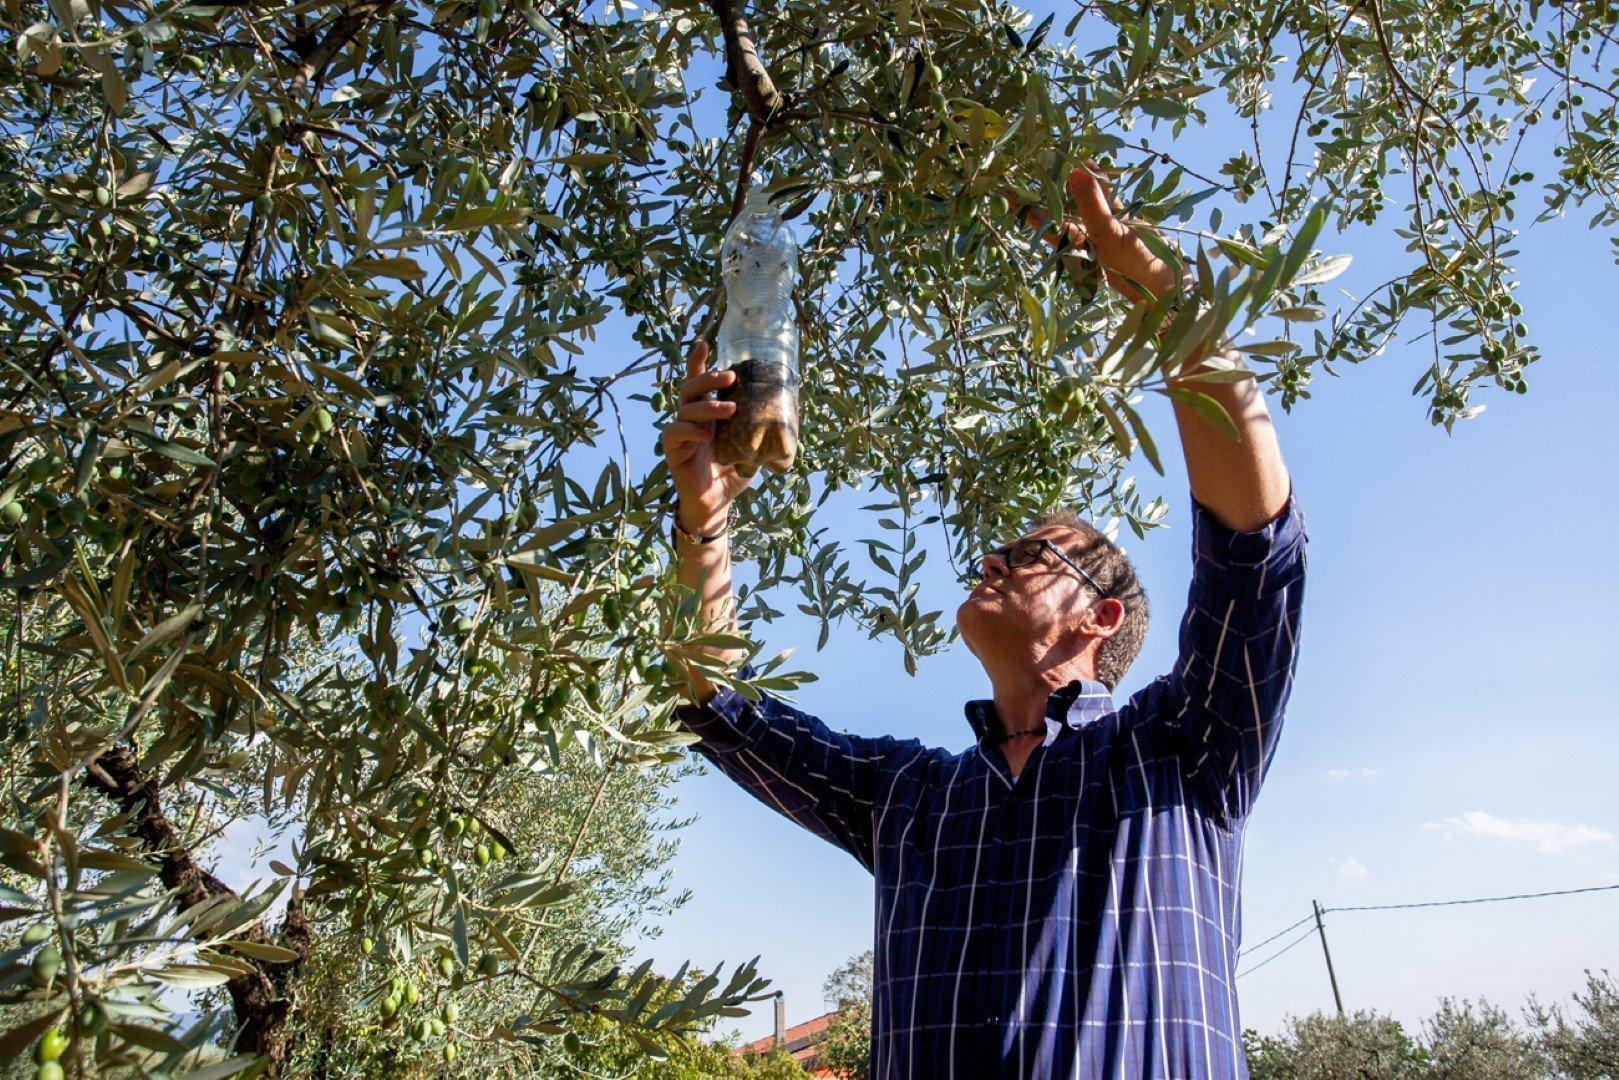 tecniche di agricoltura biologica